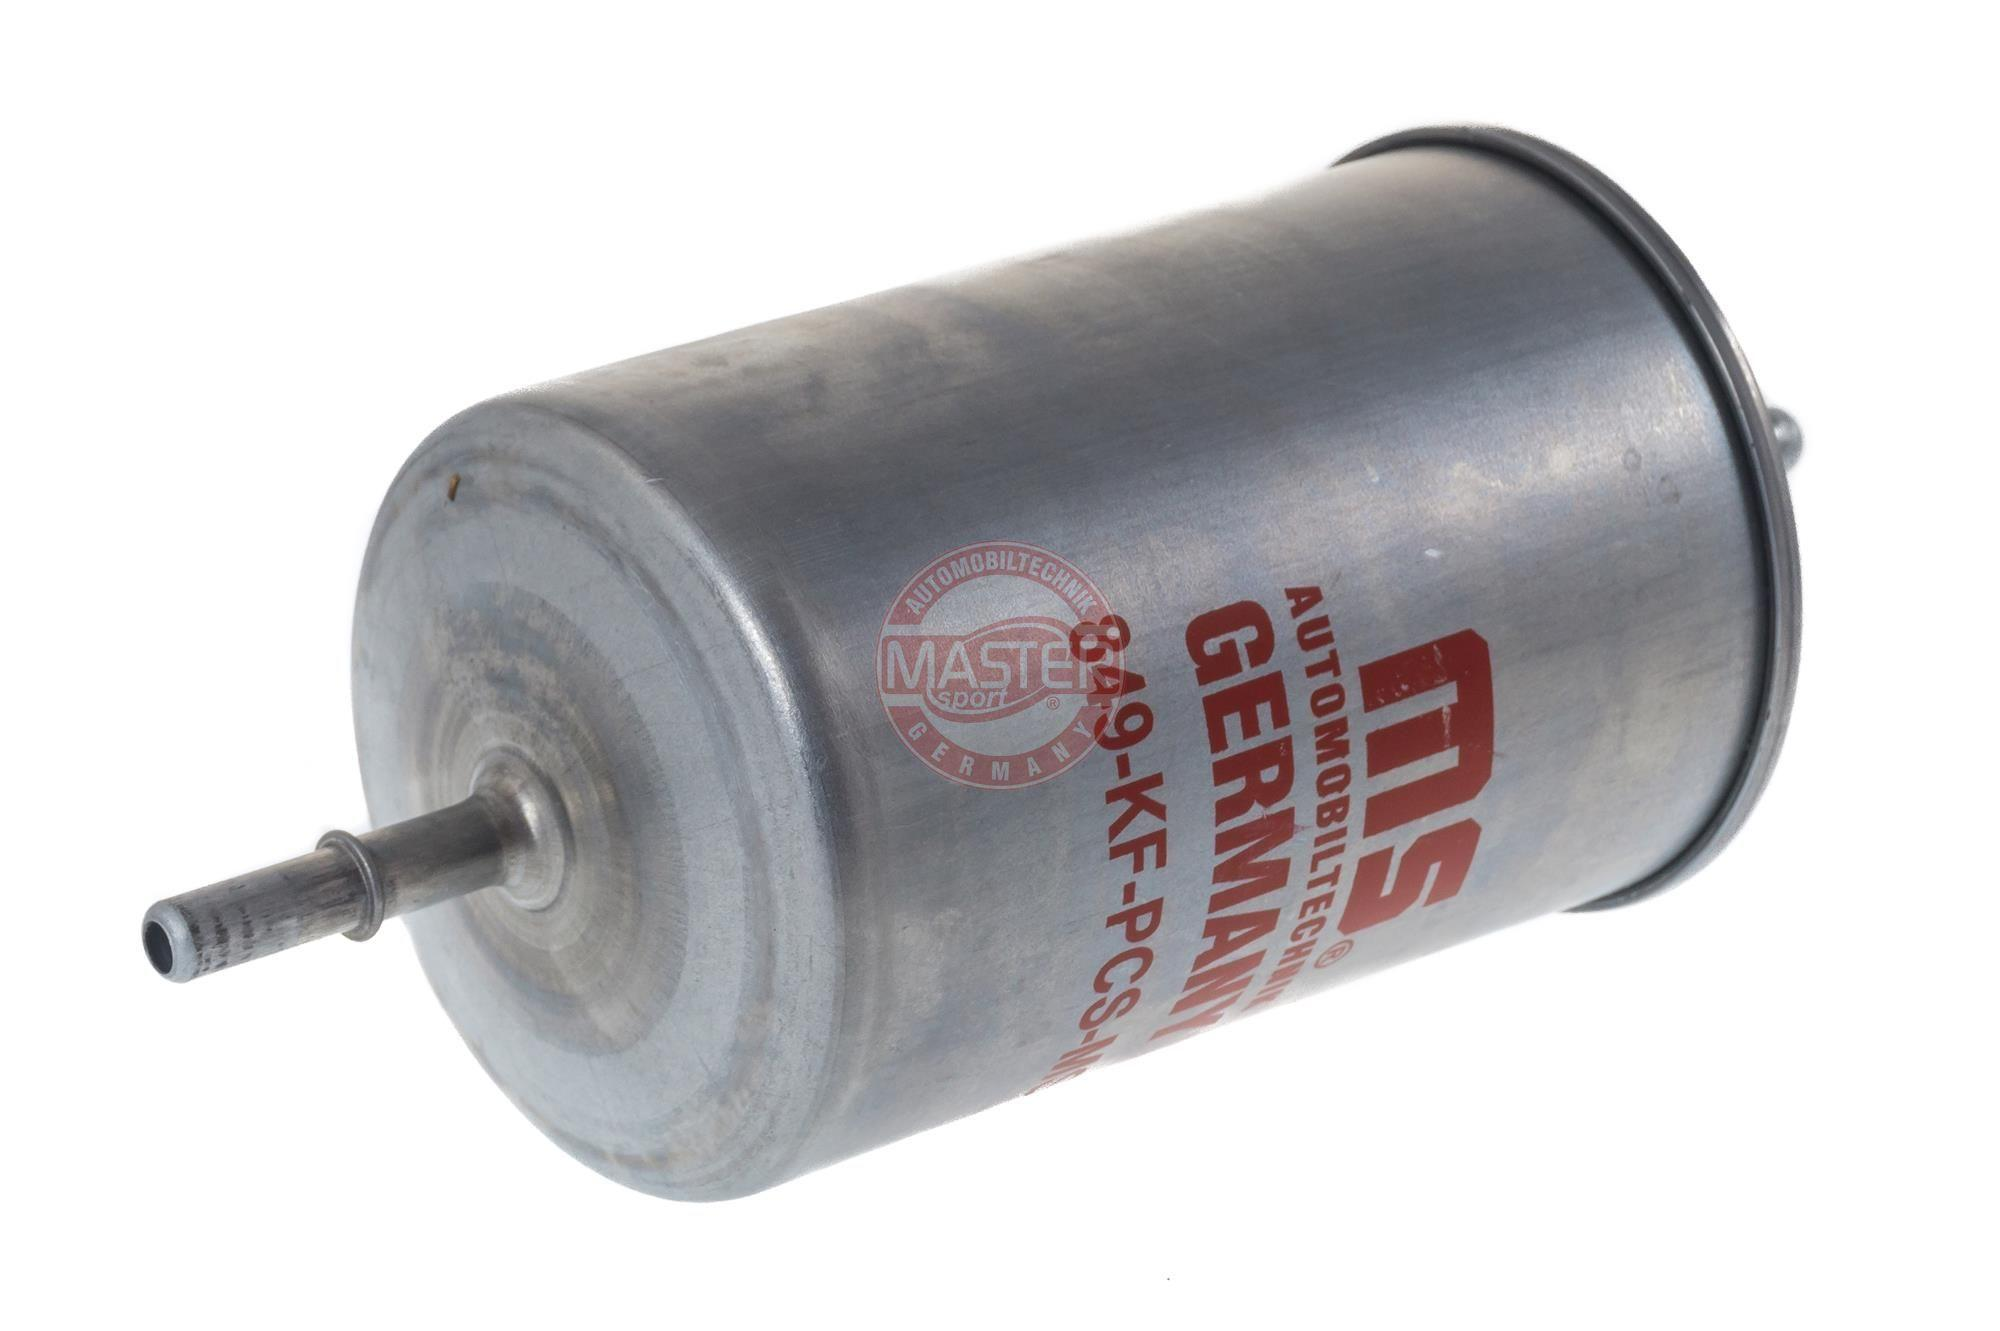 MASTER-SPORT Fuel Filter VOLVO,FORD 849-KF-PCS-MS 6192187,30671182,3507416  35074160,9142648,9142658,91426585